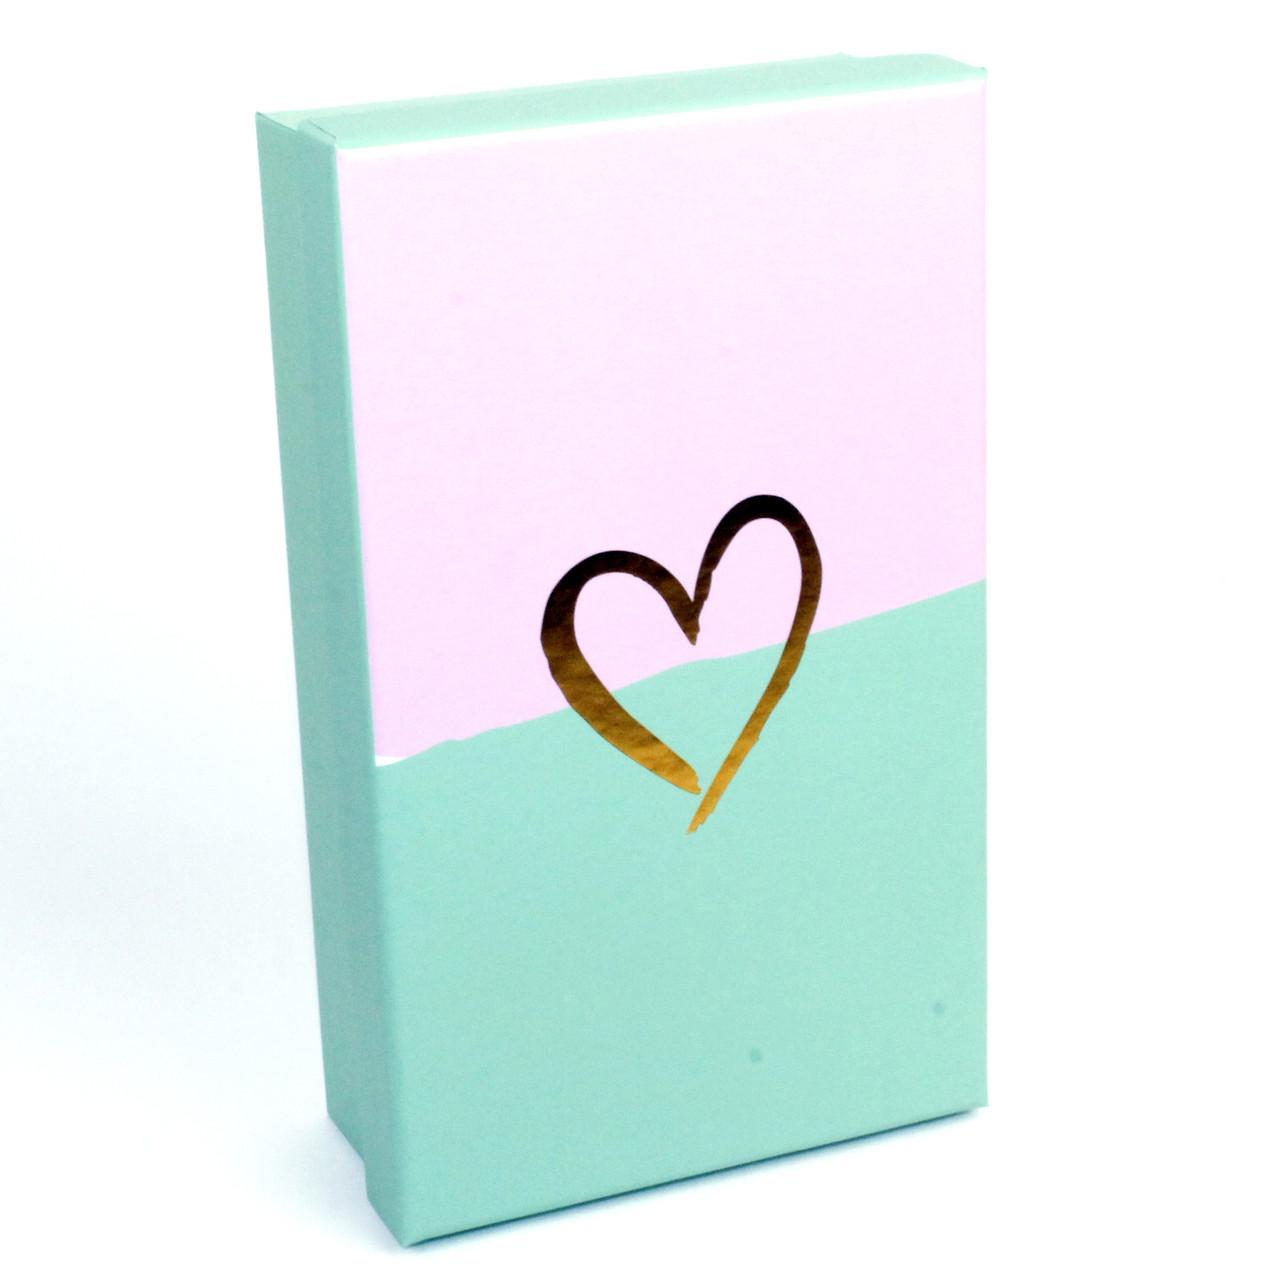 Подарочная коробка With All My Heart 20 x 13 x 5.5 см